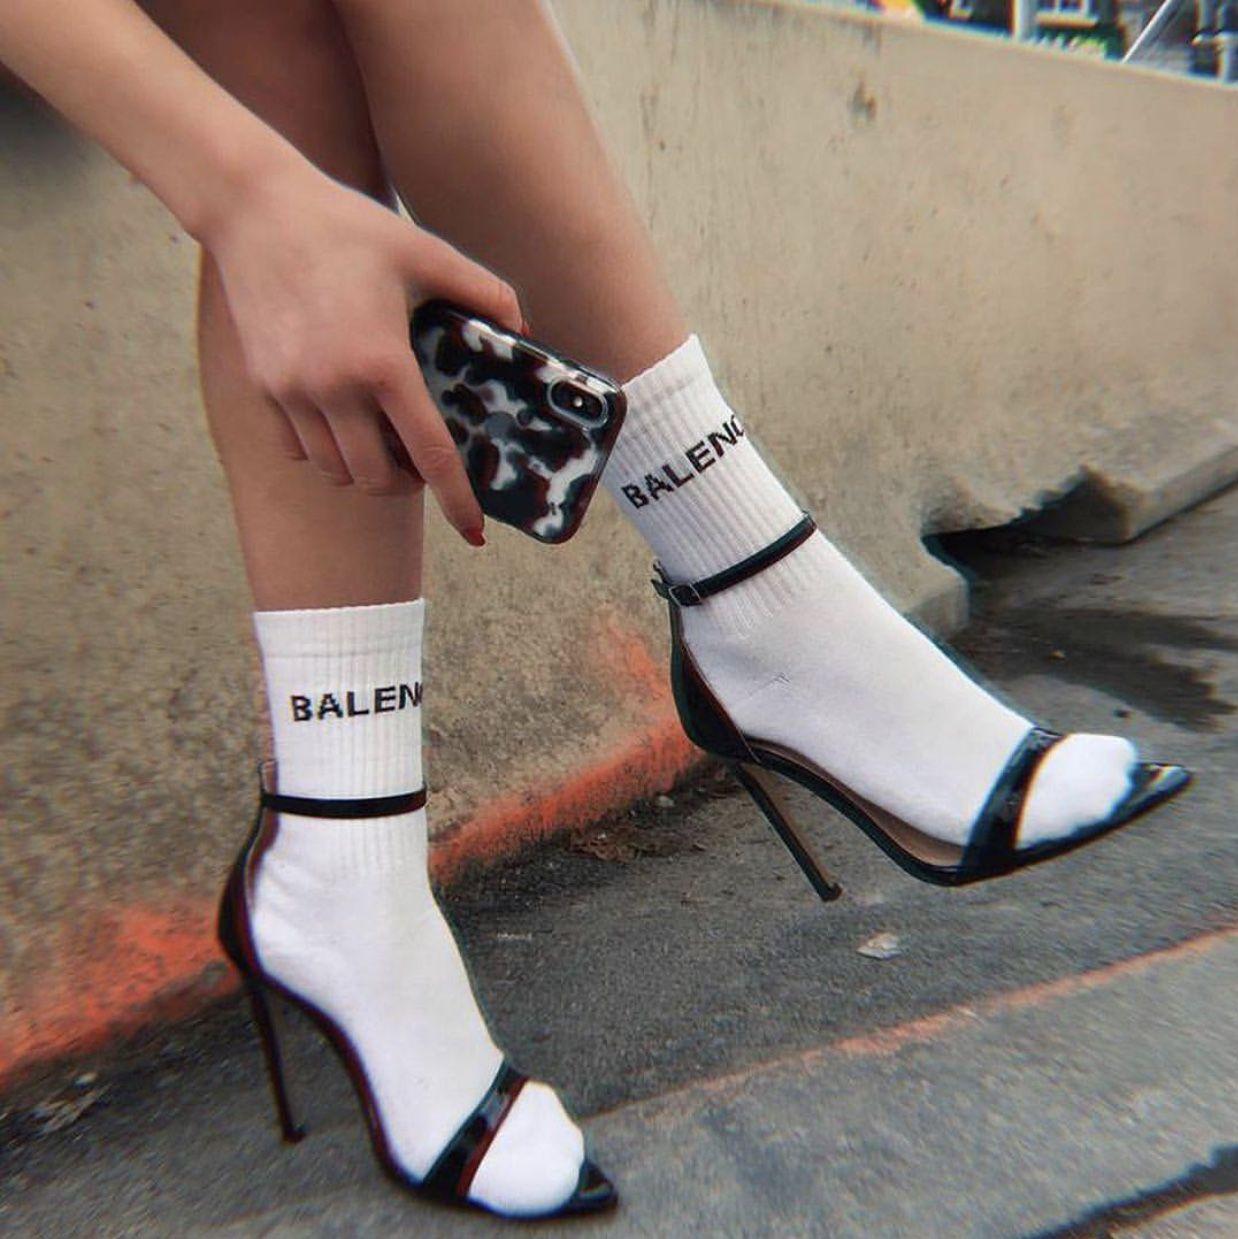 Pin By Sxrna On Shoe Game Socks And Heels Heels Stiletto Heels